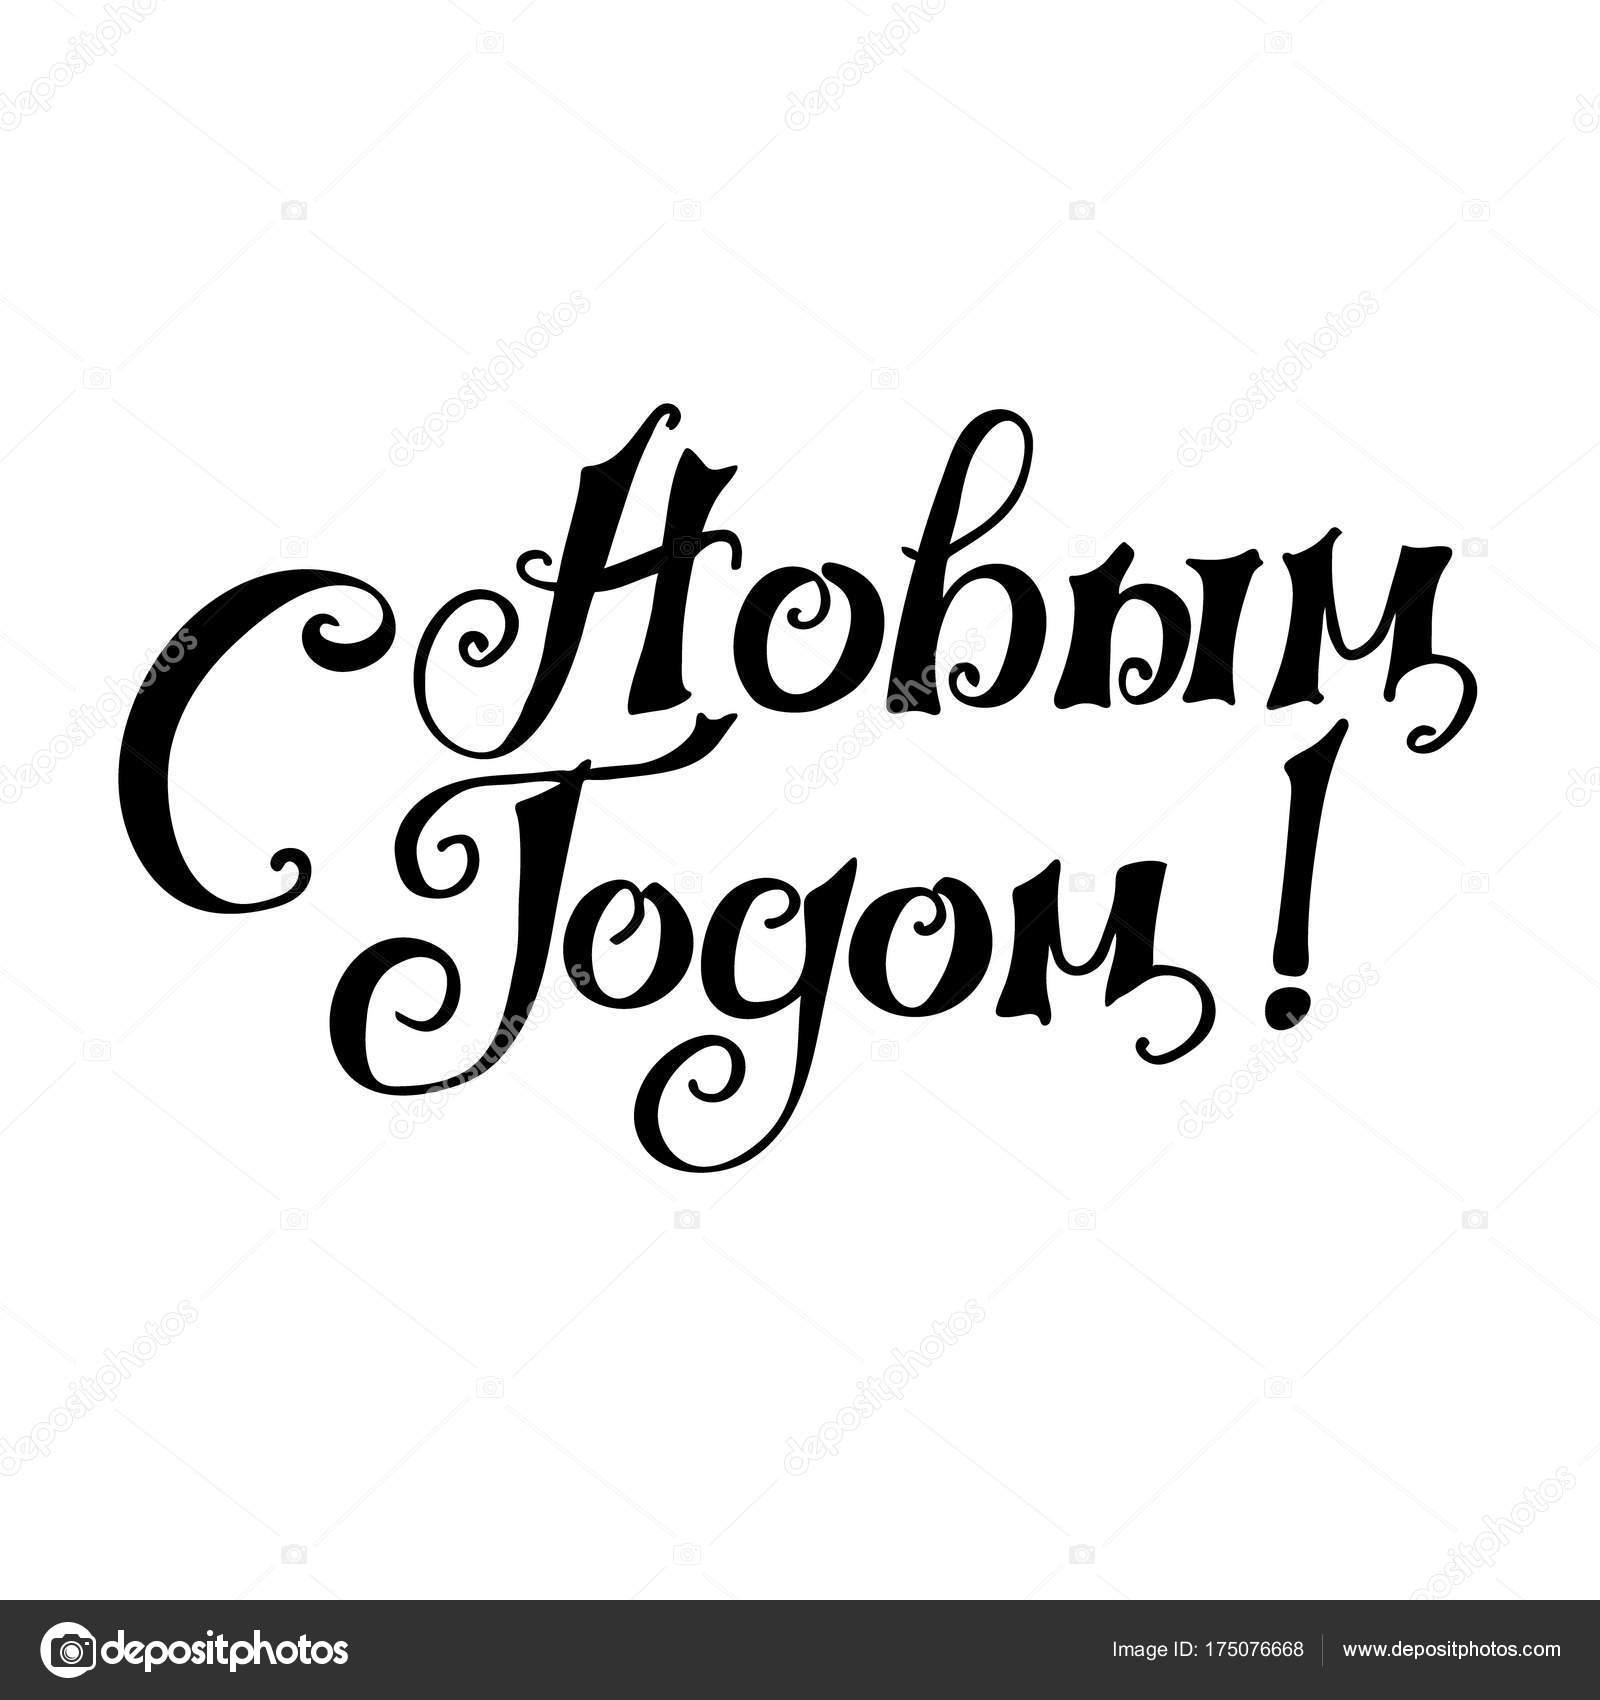 Rotulación Con Frase En La Lengua Rusa Calientes Deseos De